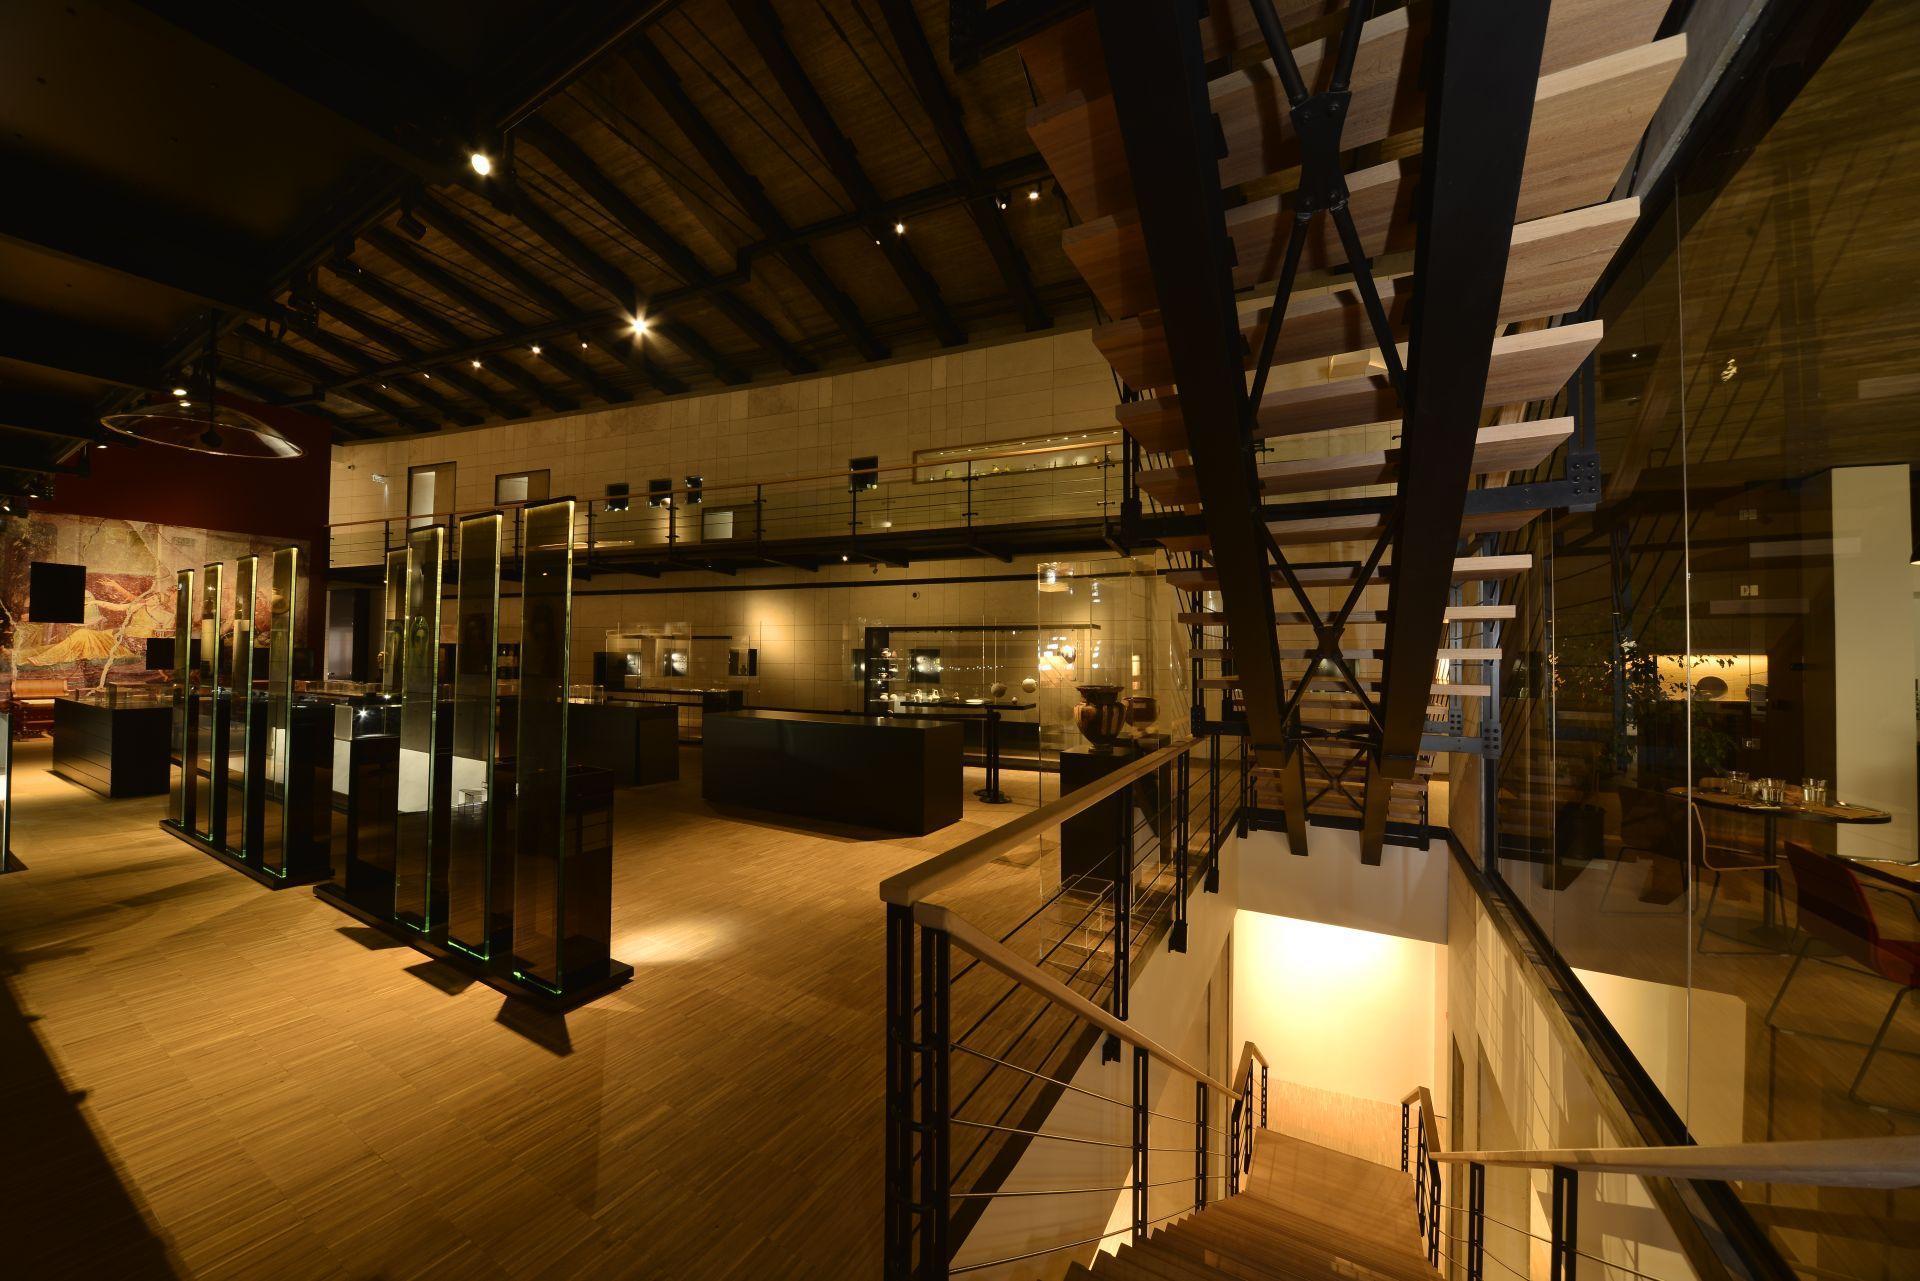 erimtan_archaeological_museum_-_turkey